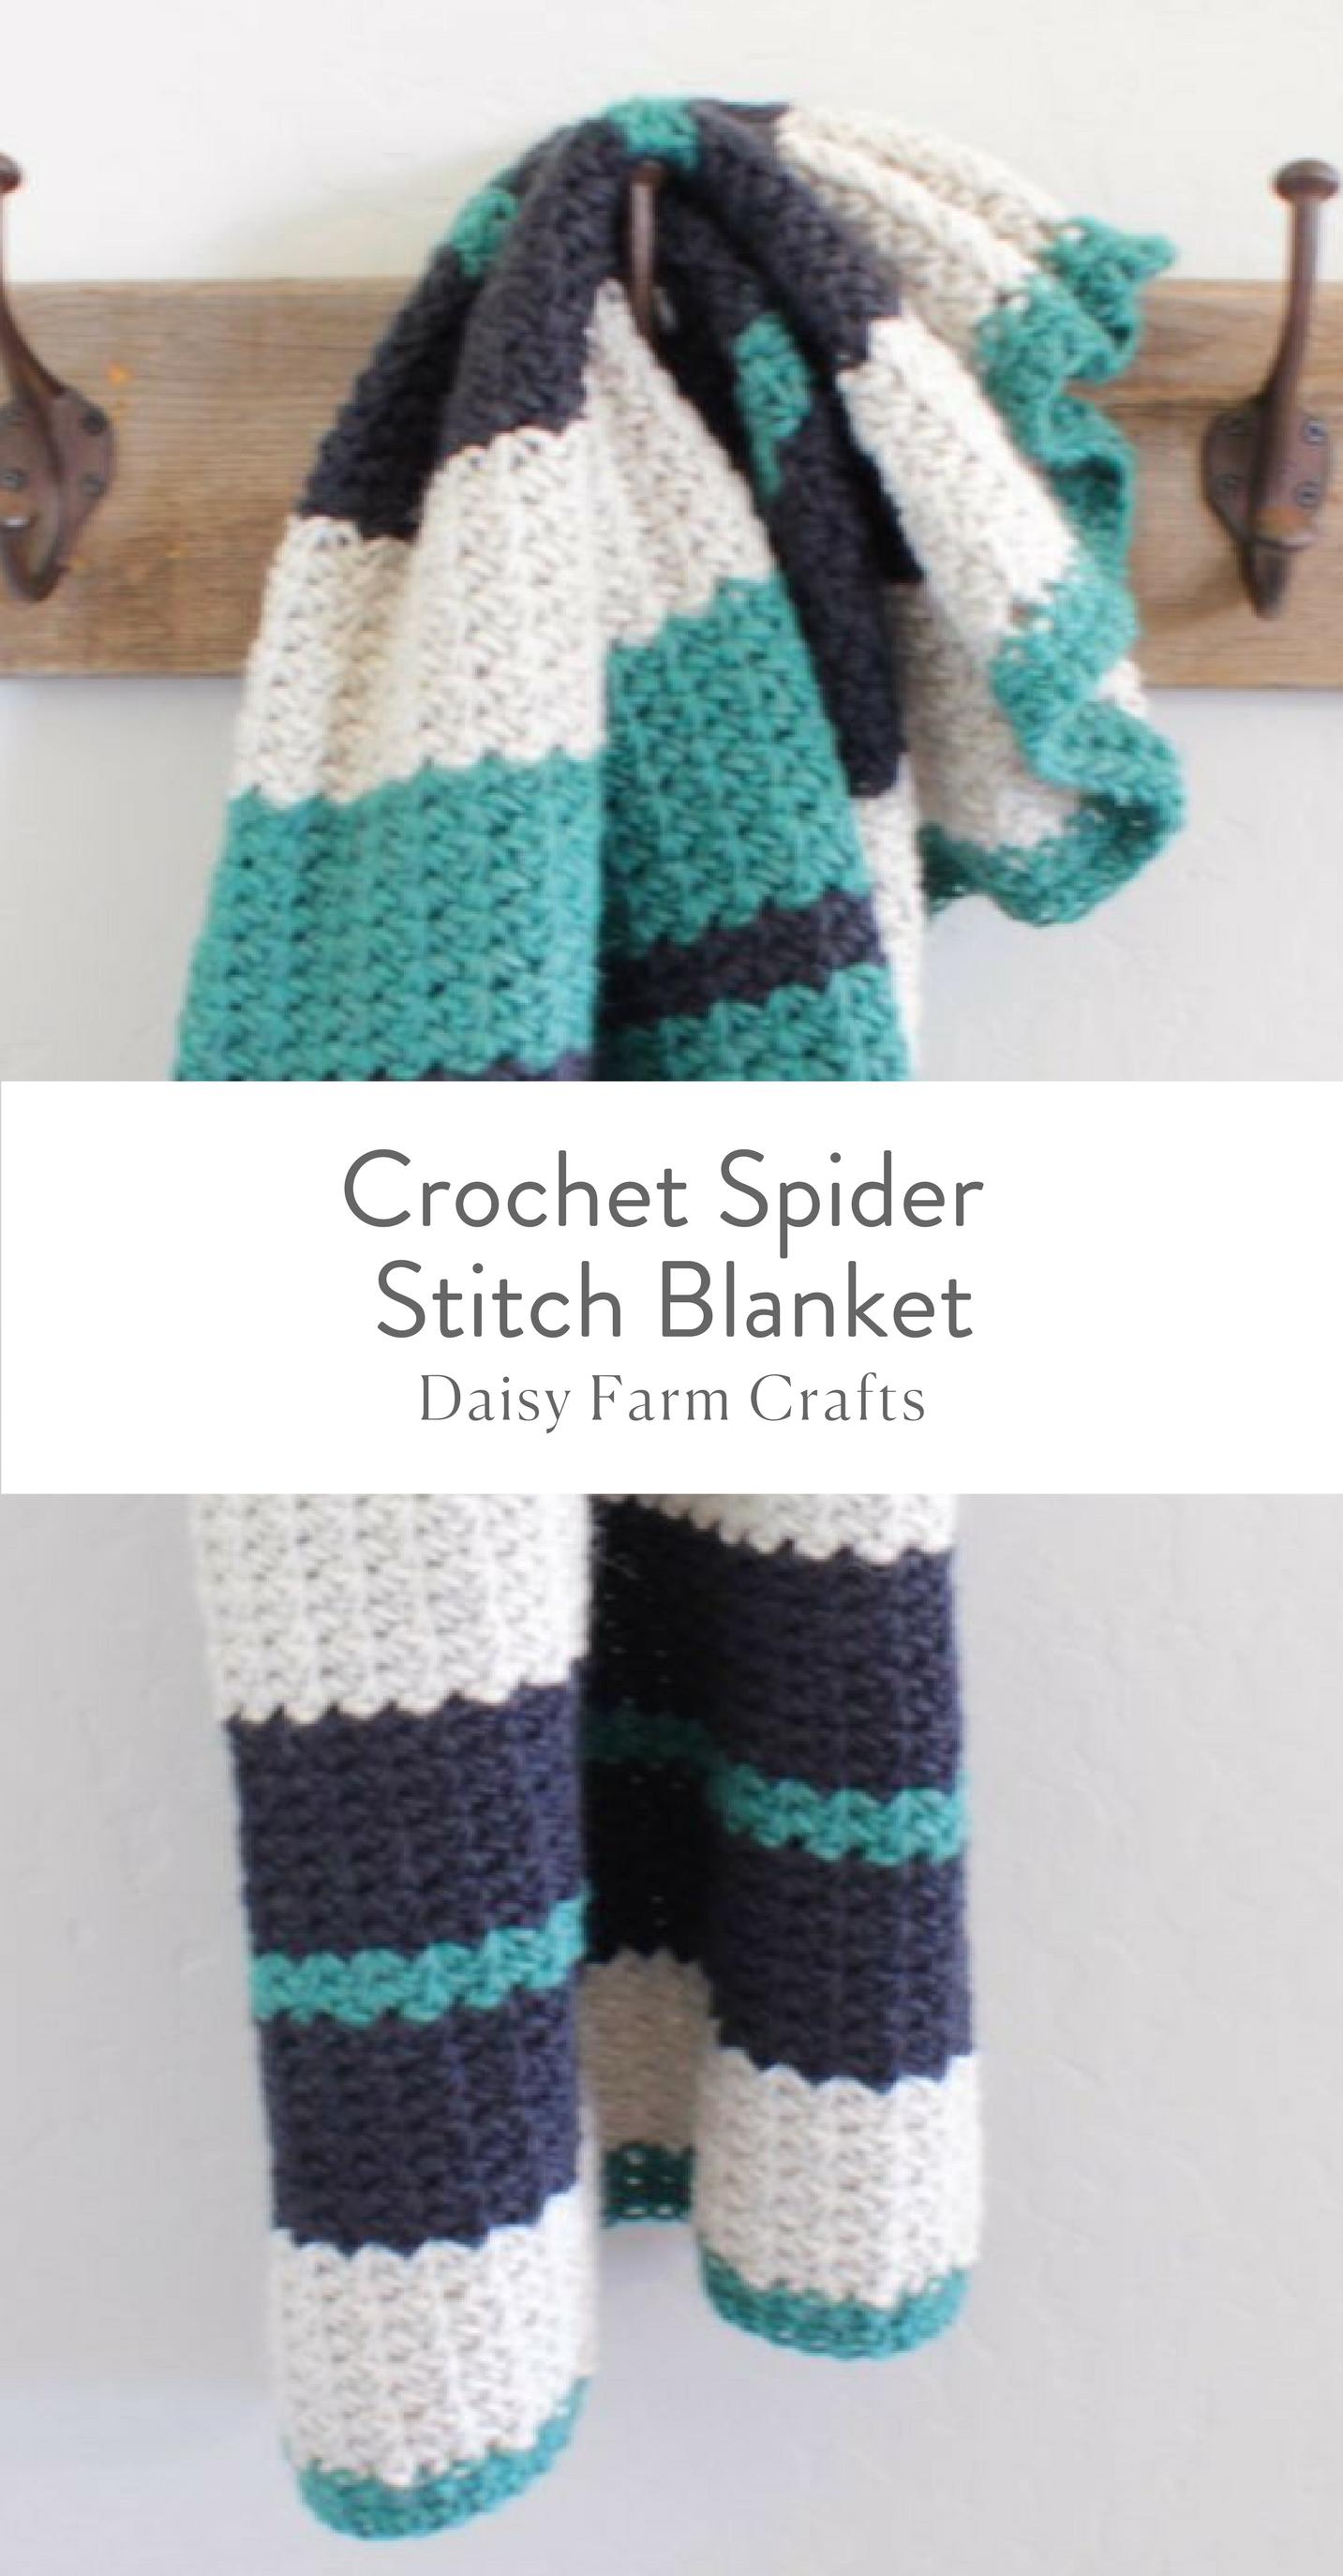 Free Pattern - Crochet Spider Stitch Blanket | Crochet | Pinterest ...